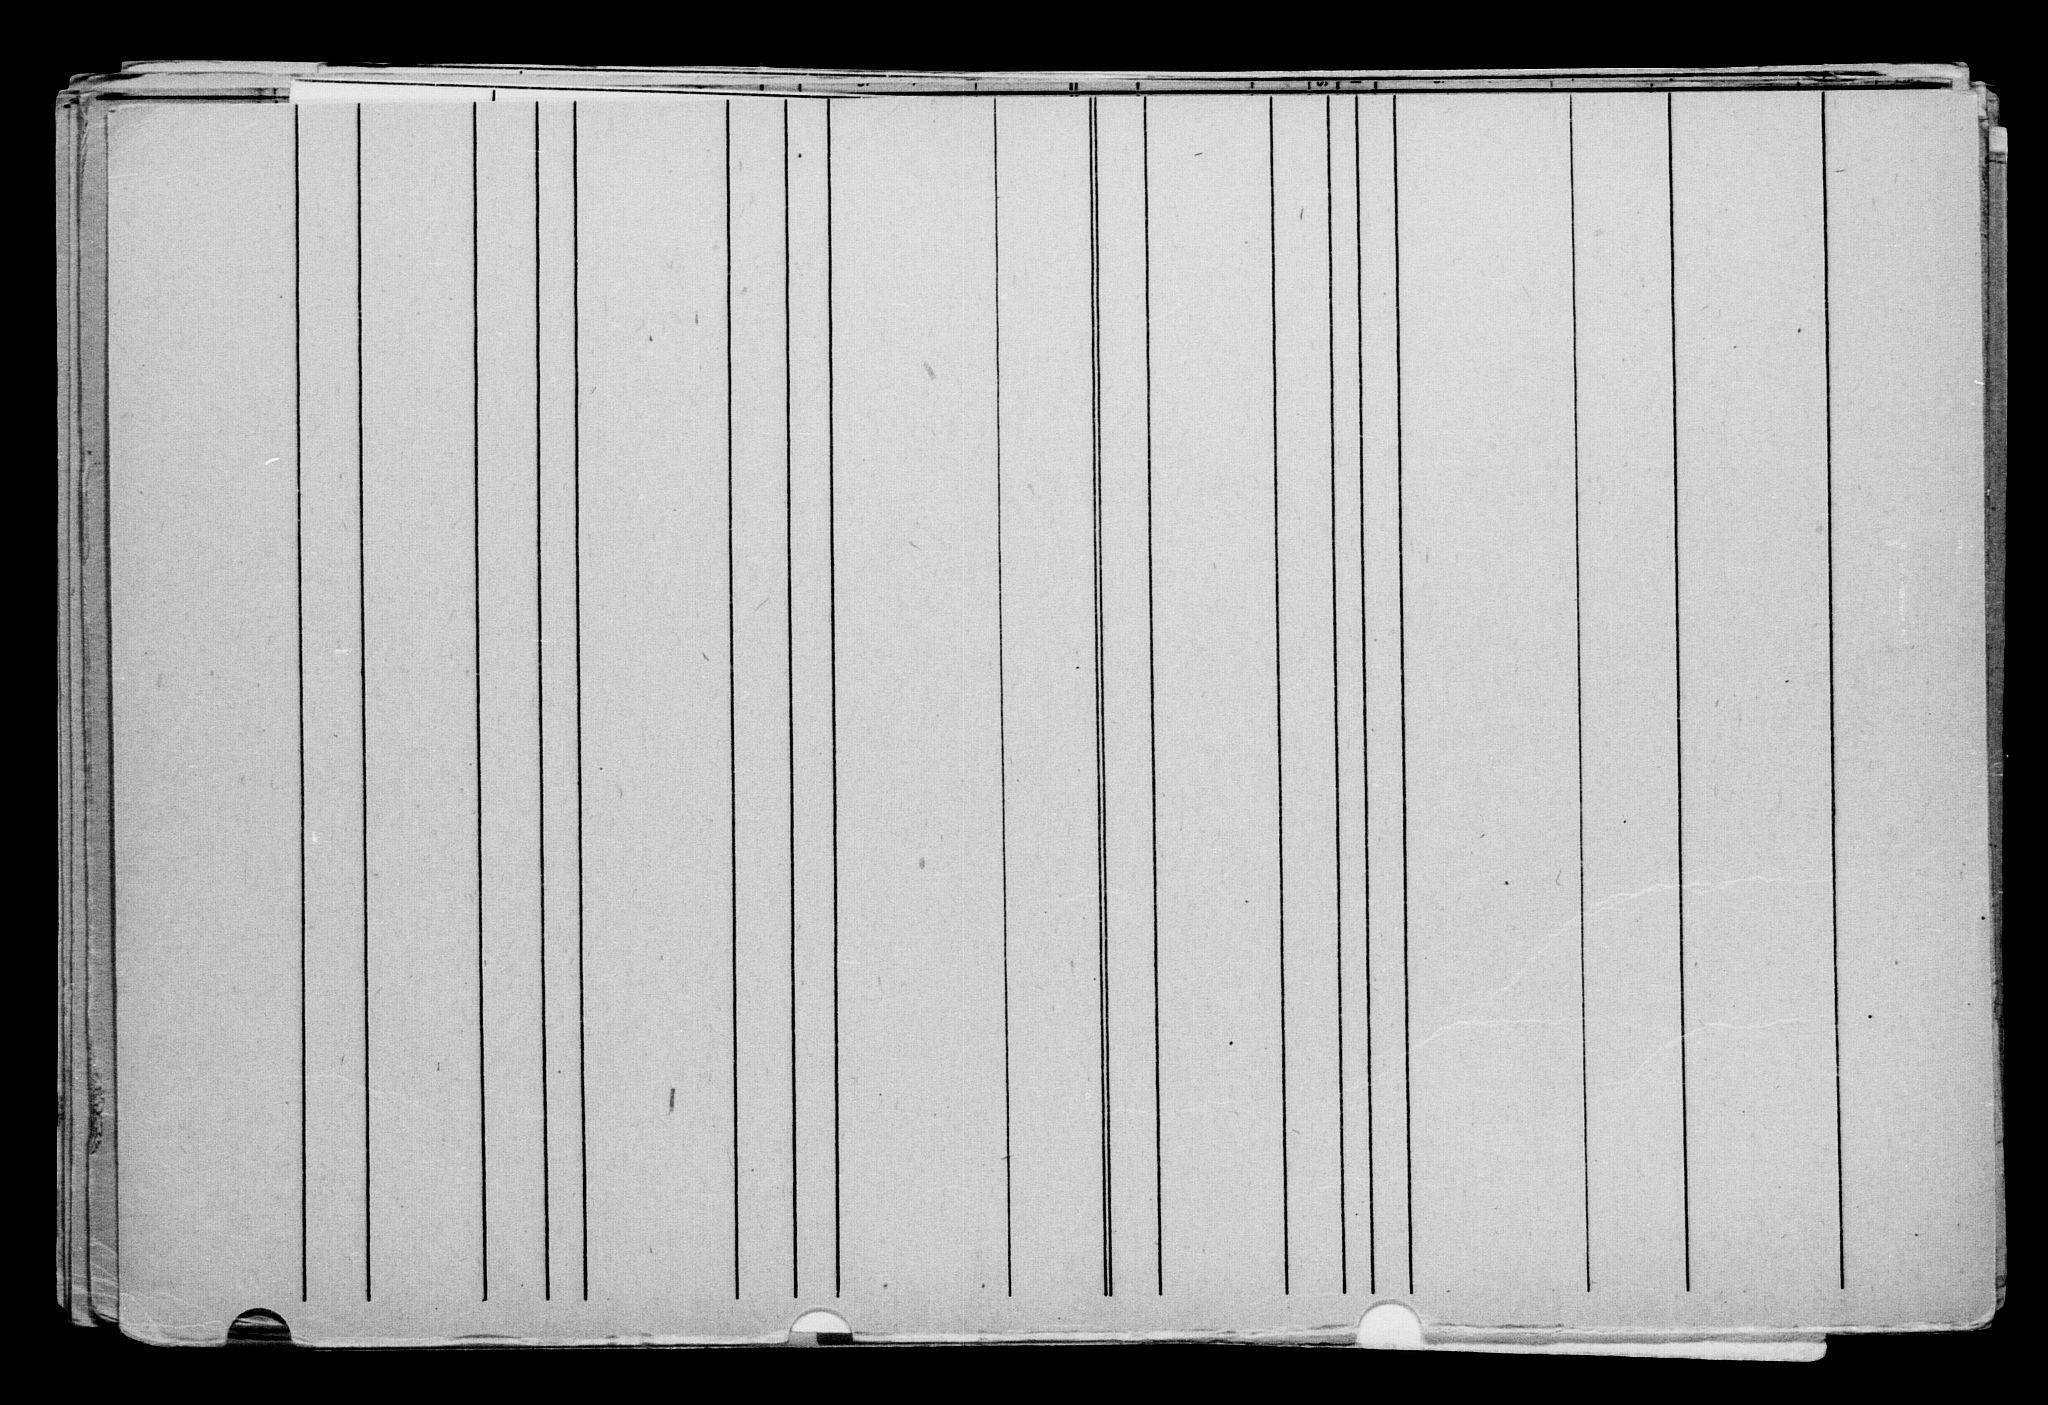 RA, Direktoratet for sjømenn, G/Gb/L0005: Hovedkort, 1888, s. 98